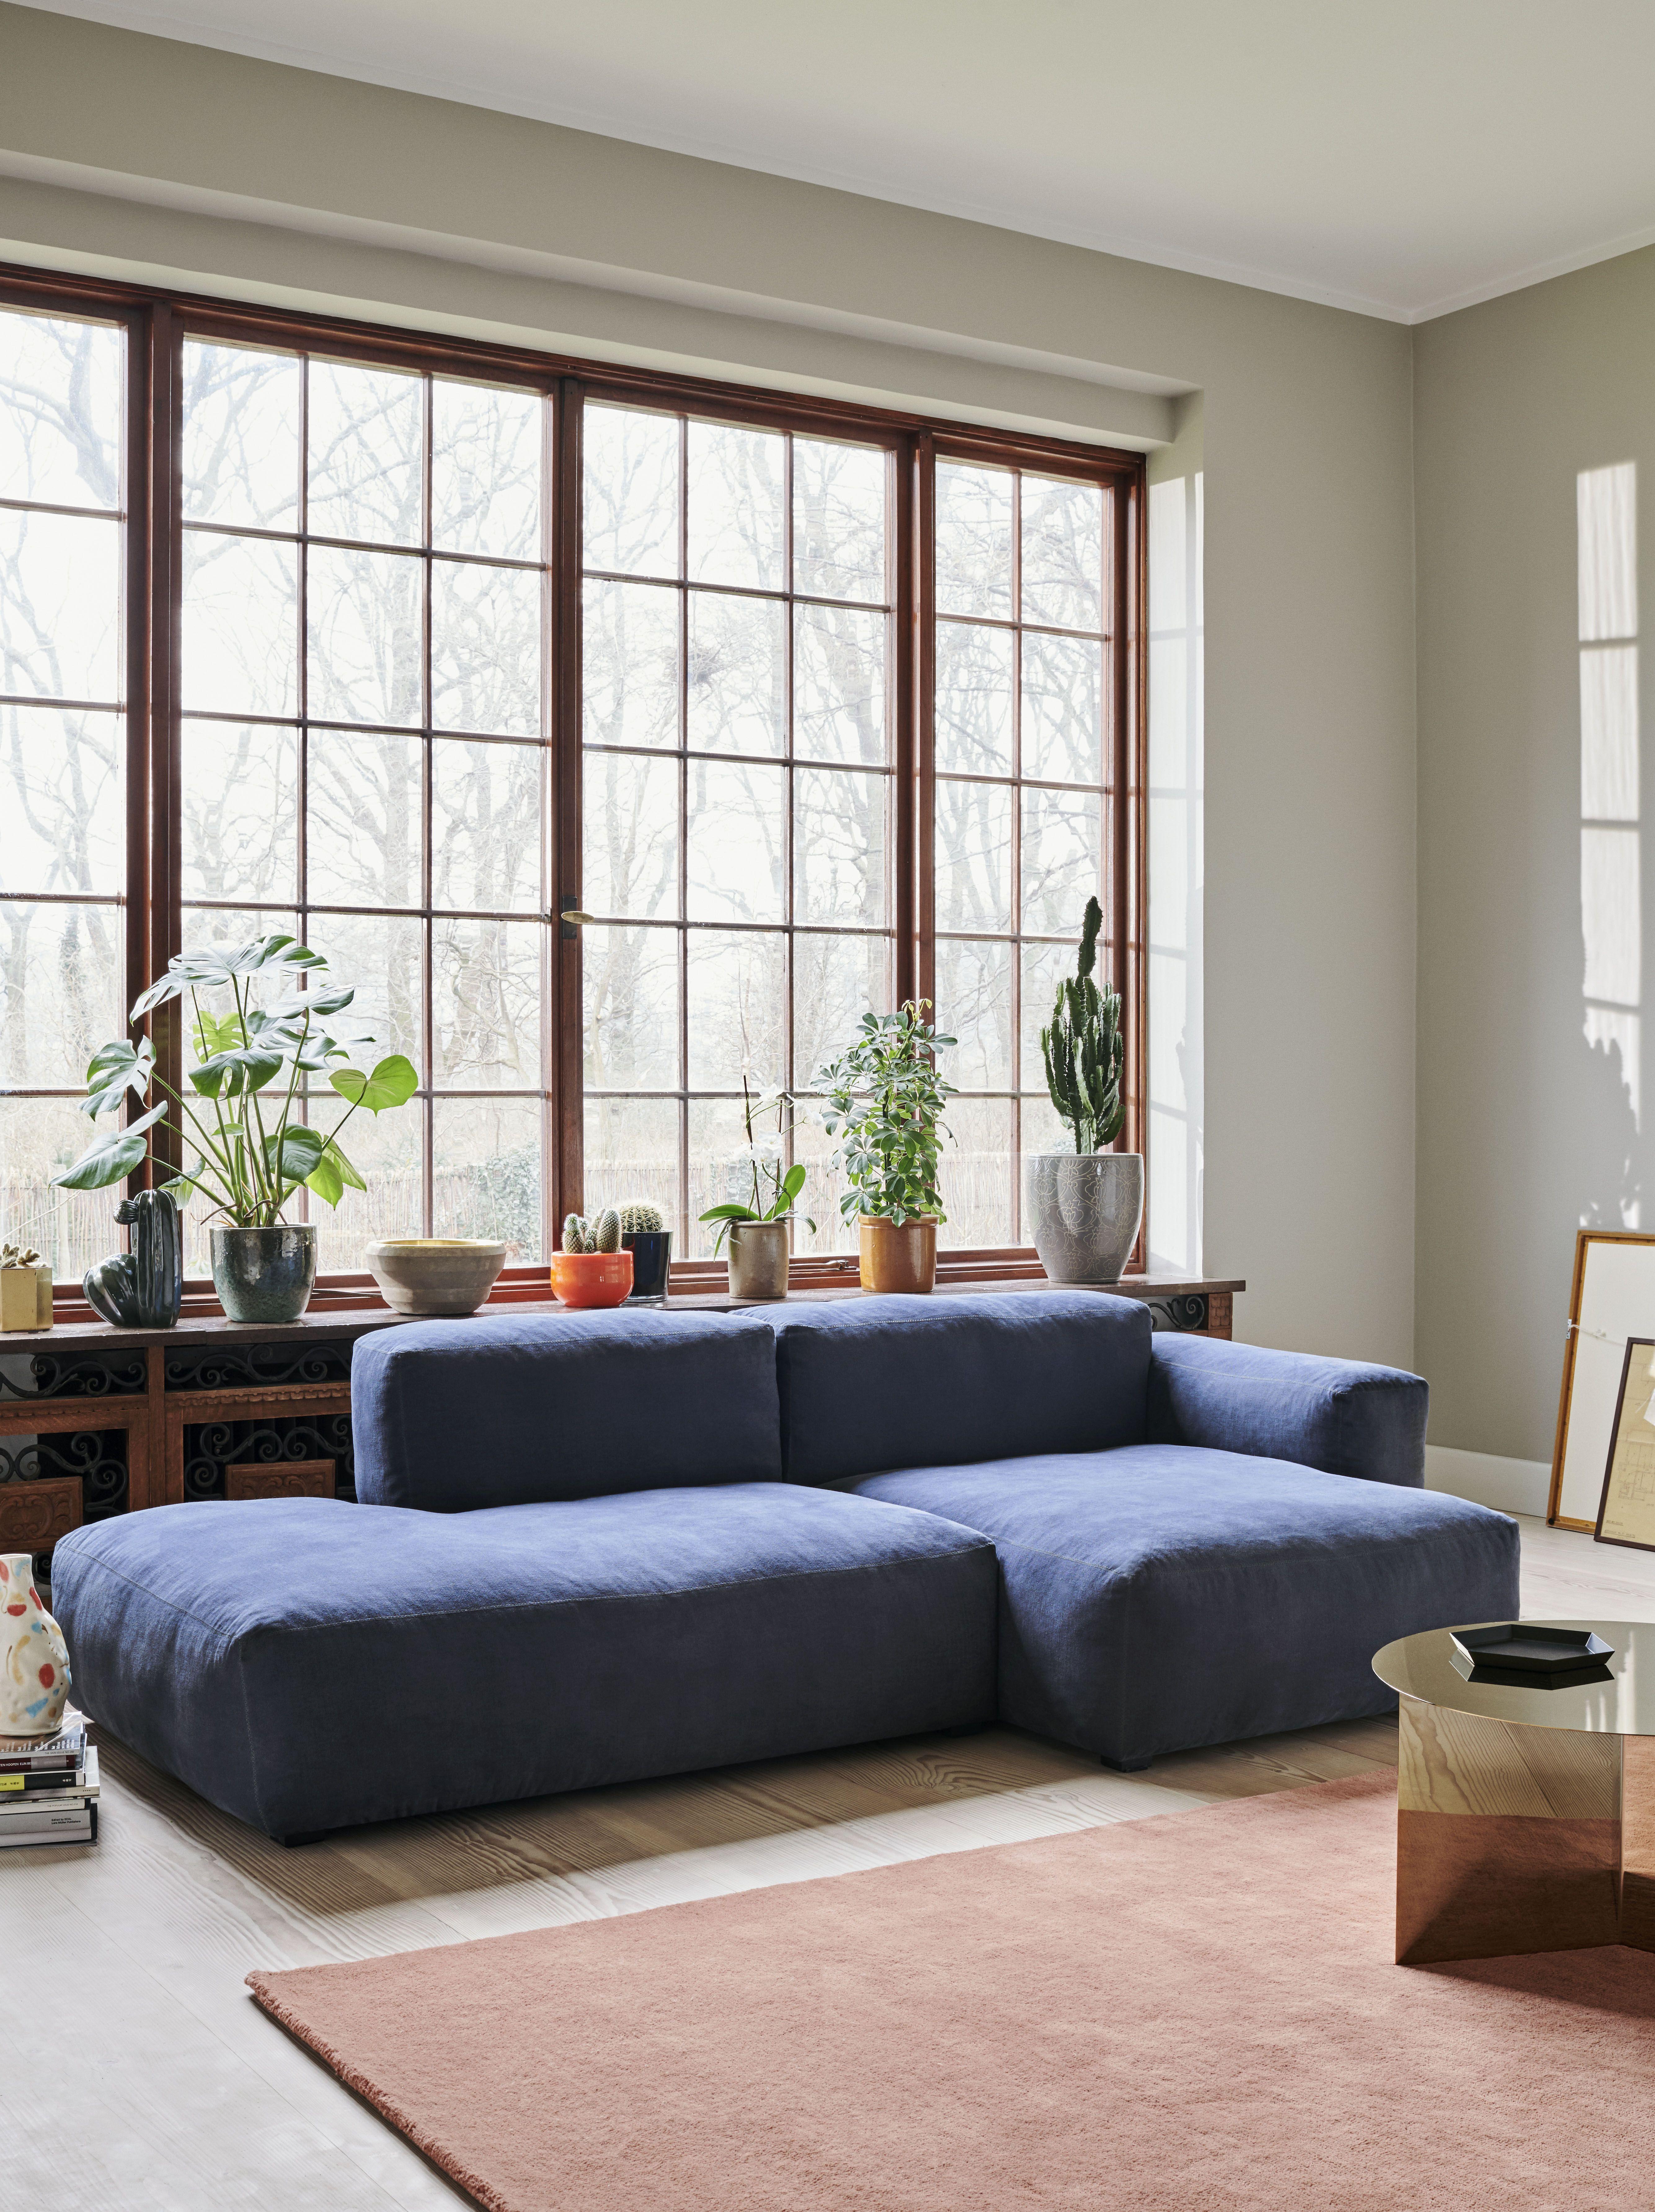 Lackadaisical Living Room Furniture Layout Furniturevintage Smalllivingroomfurniture Wohnzimmer Design Wohnzimmer Einrichten Wohnzimmer Inspiration